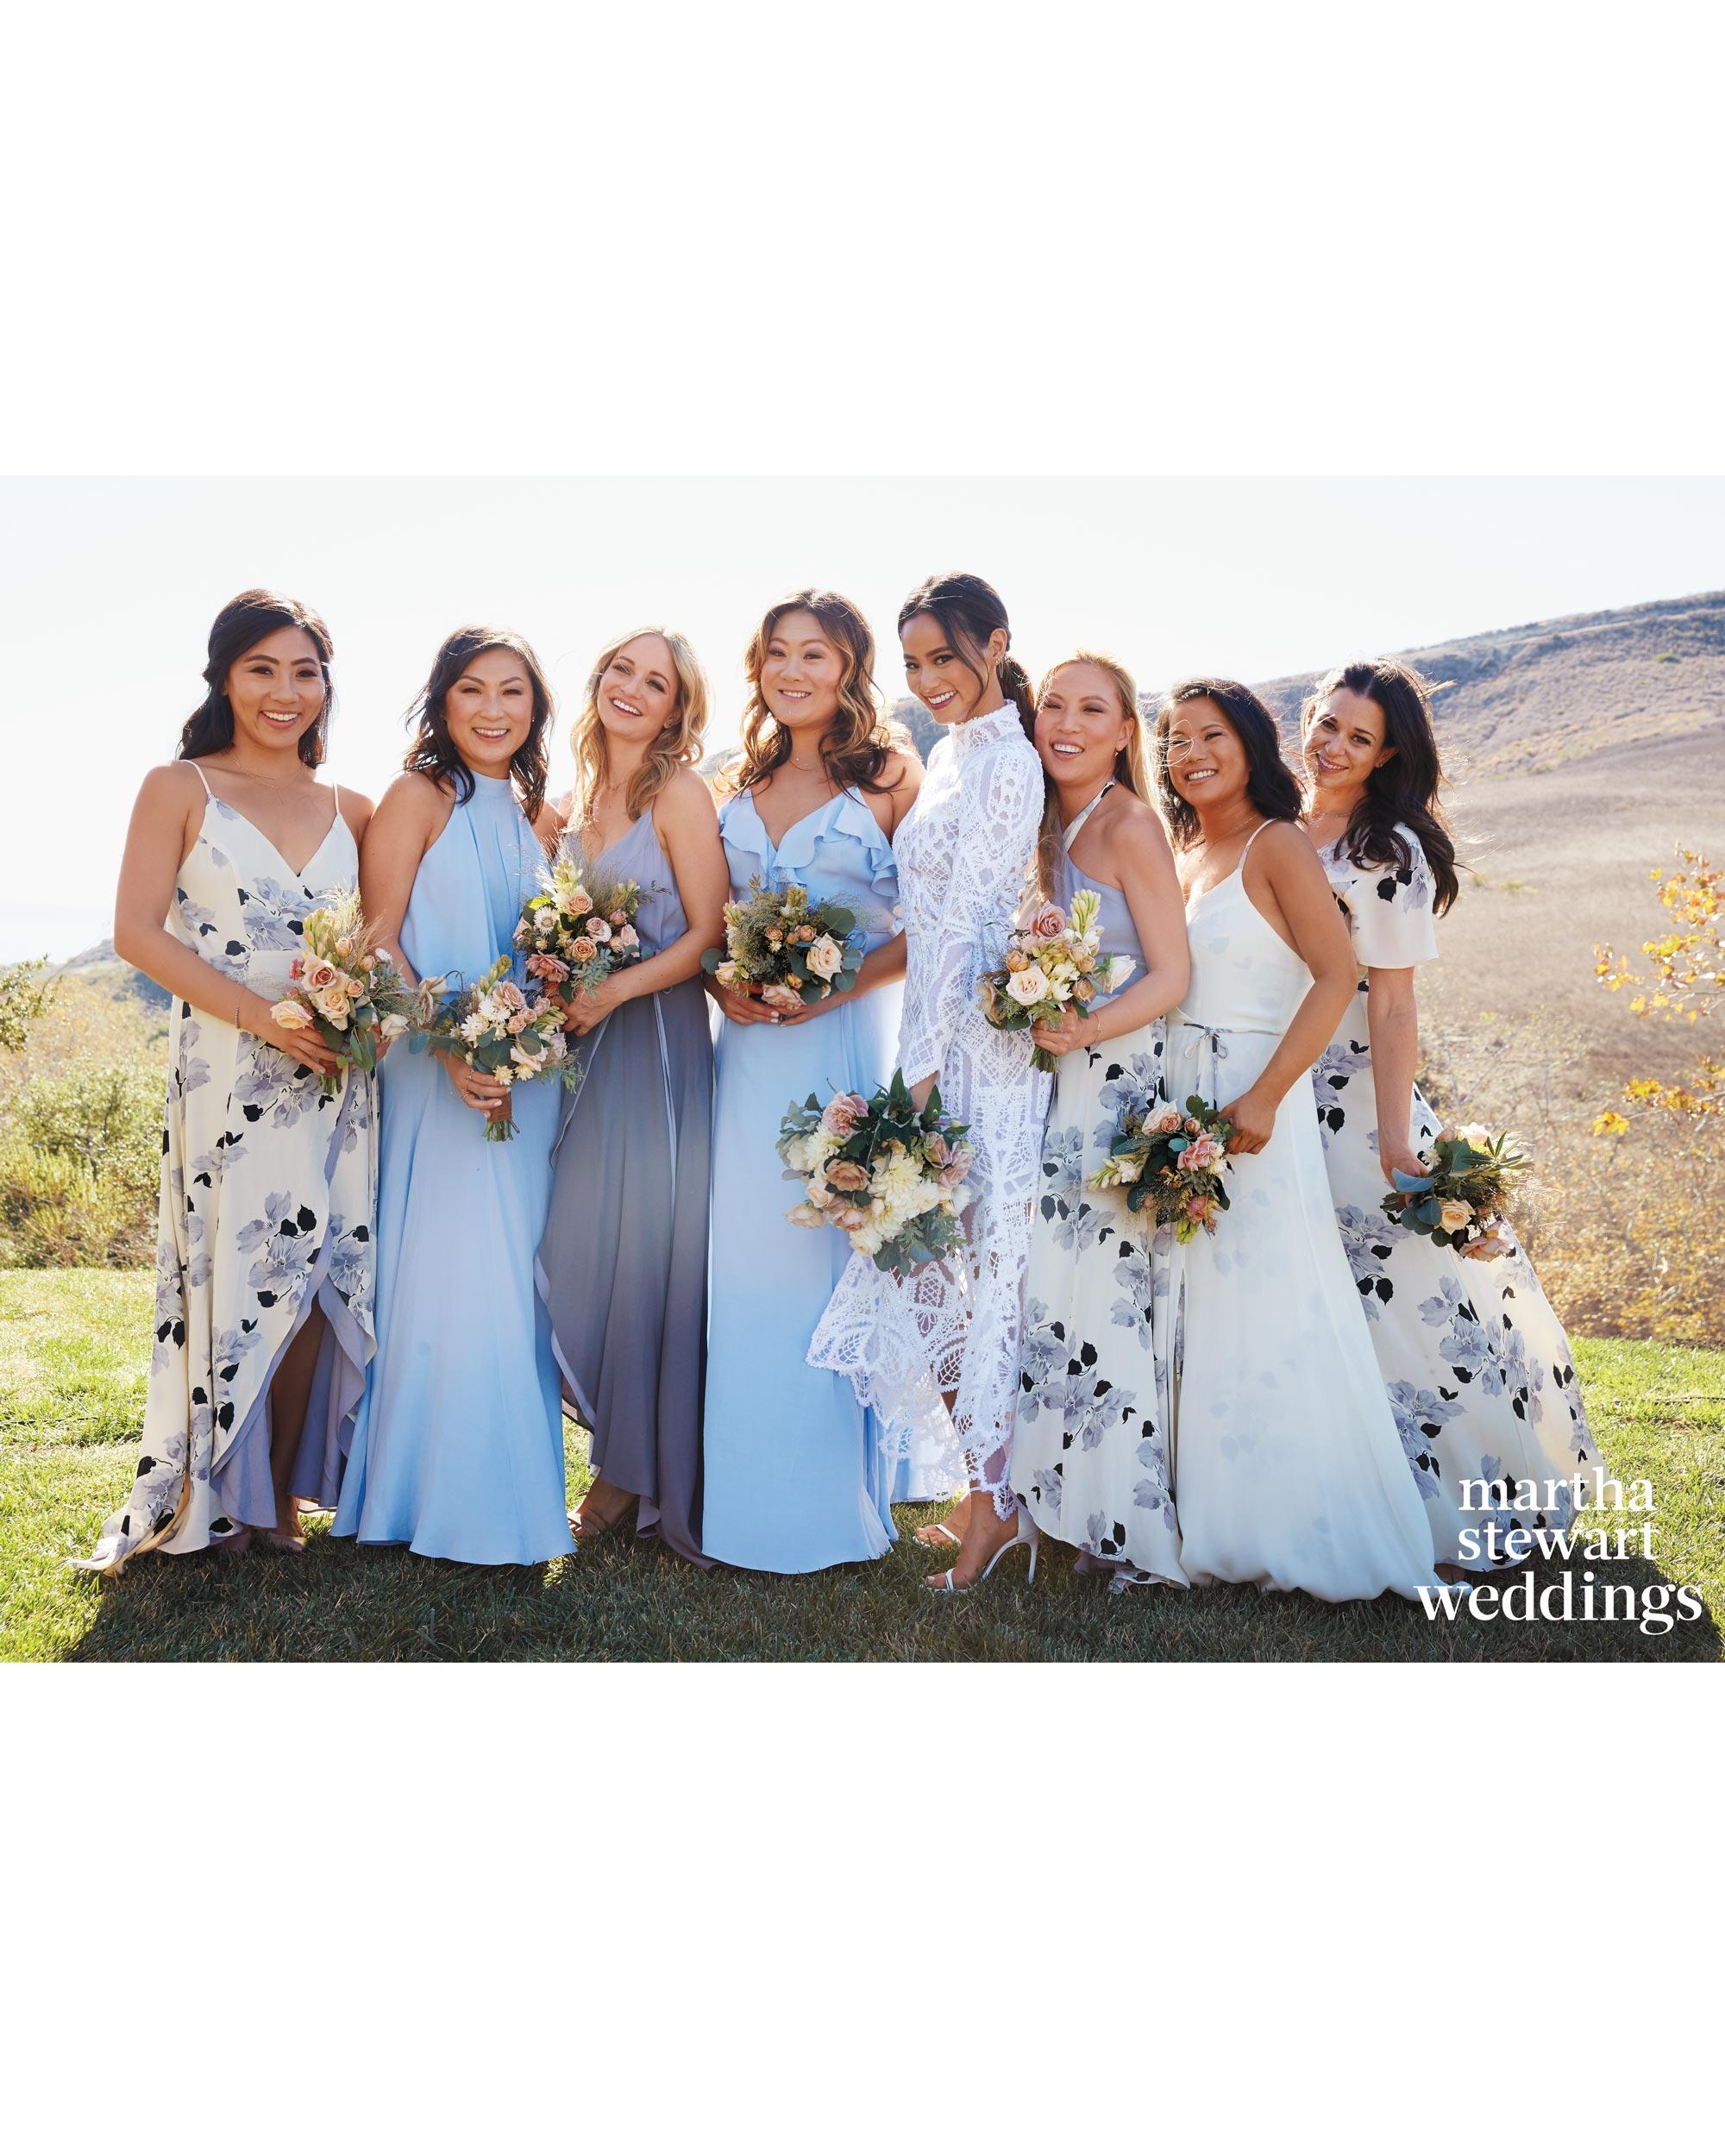 jamie-bryan-wedding-21-wedding-party-bridesmaids-2036-d112664.jpg